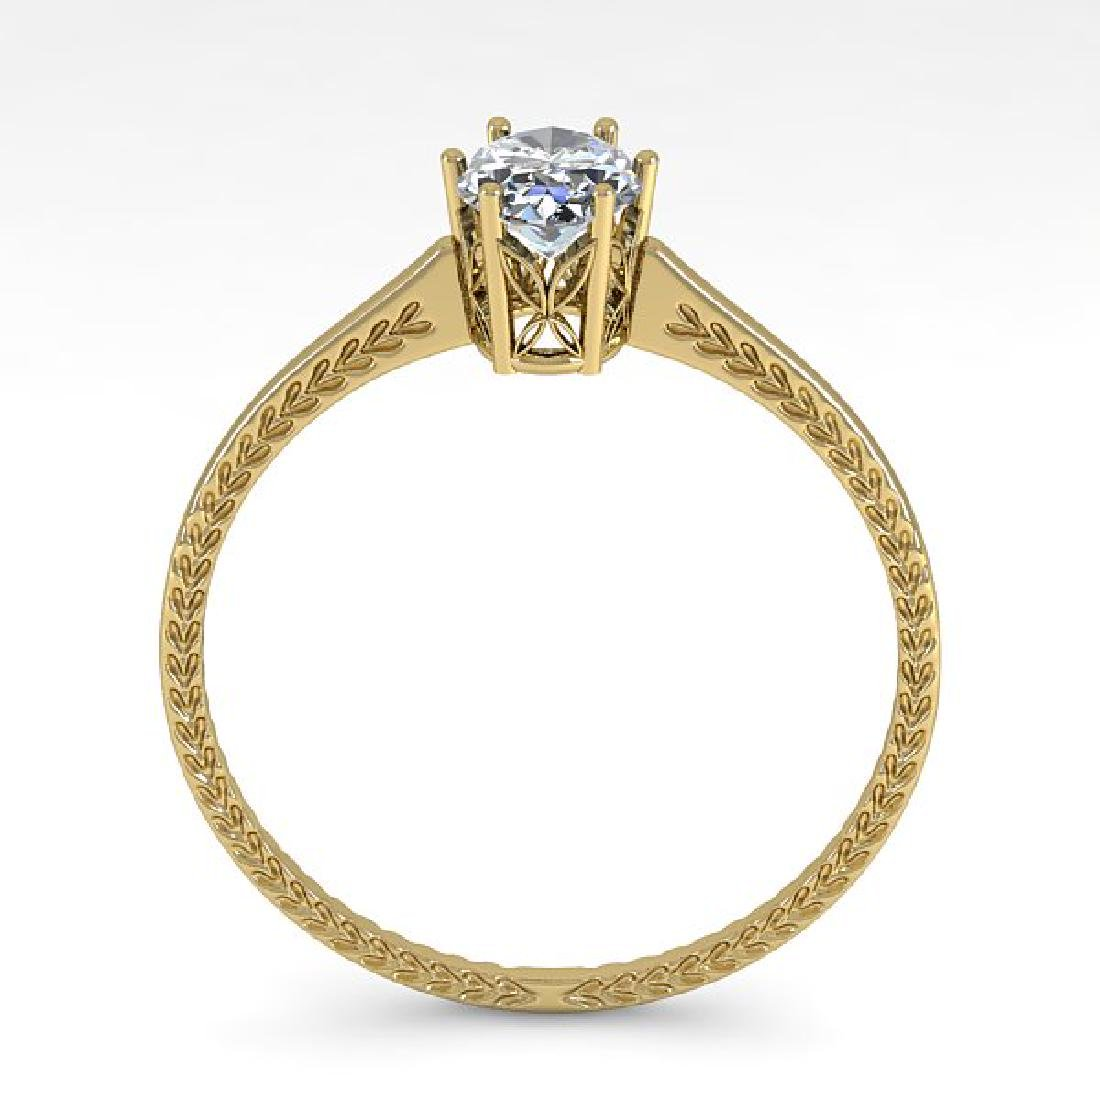 1.0 CTW VS/SI Oval Cut Diamond Art Deco Ring 14K Yellow - 3